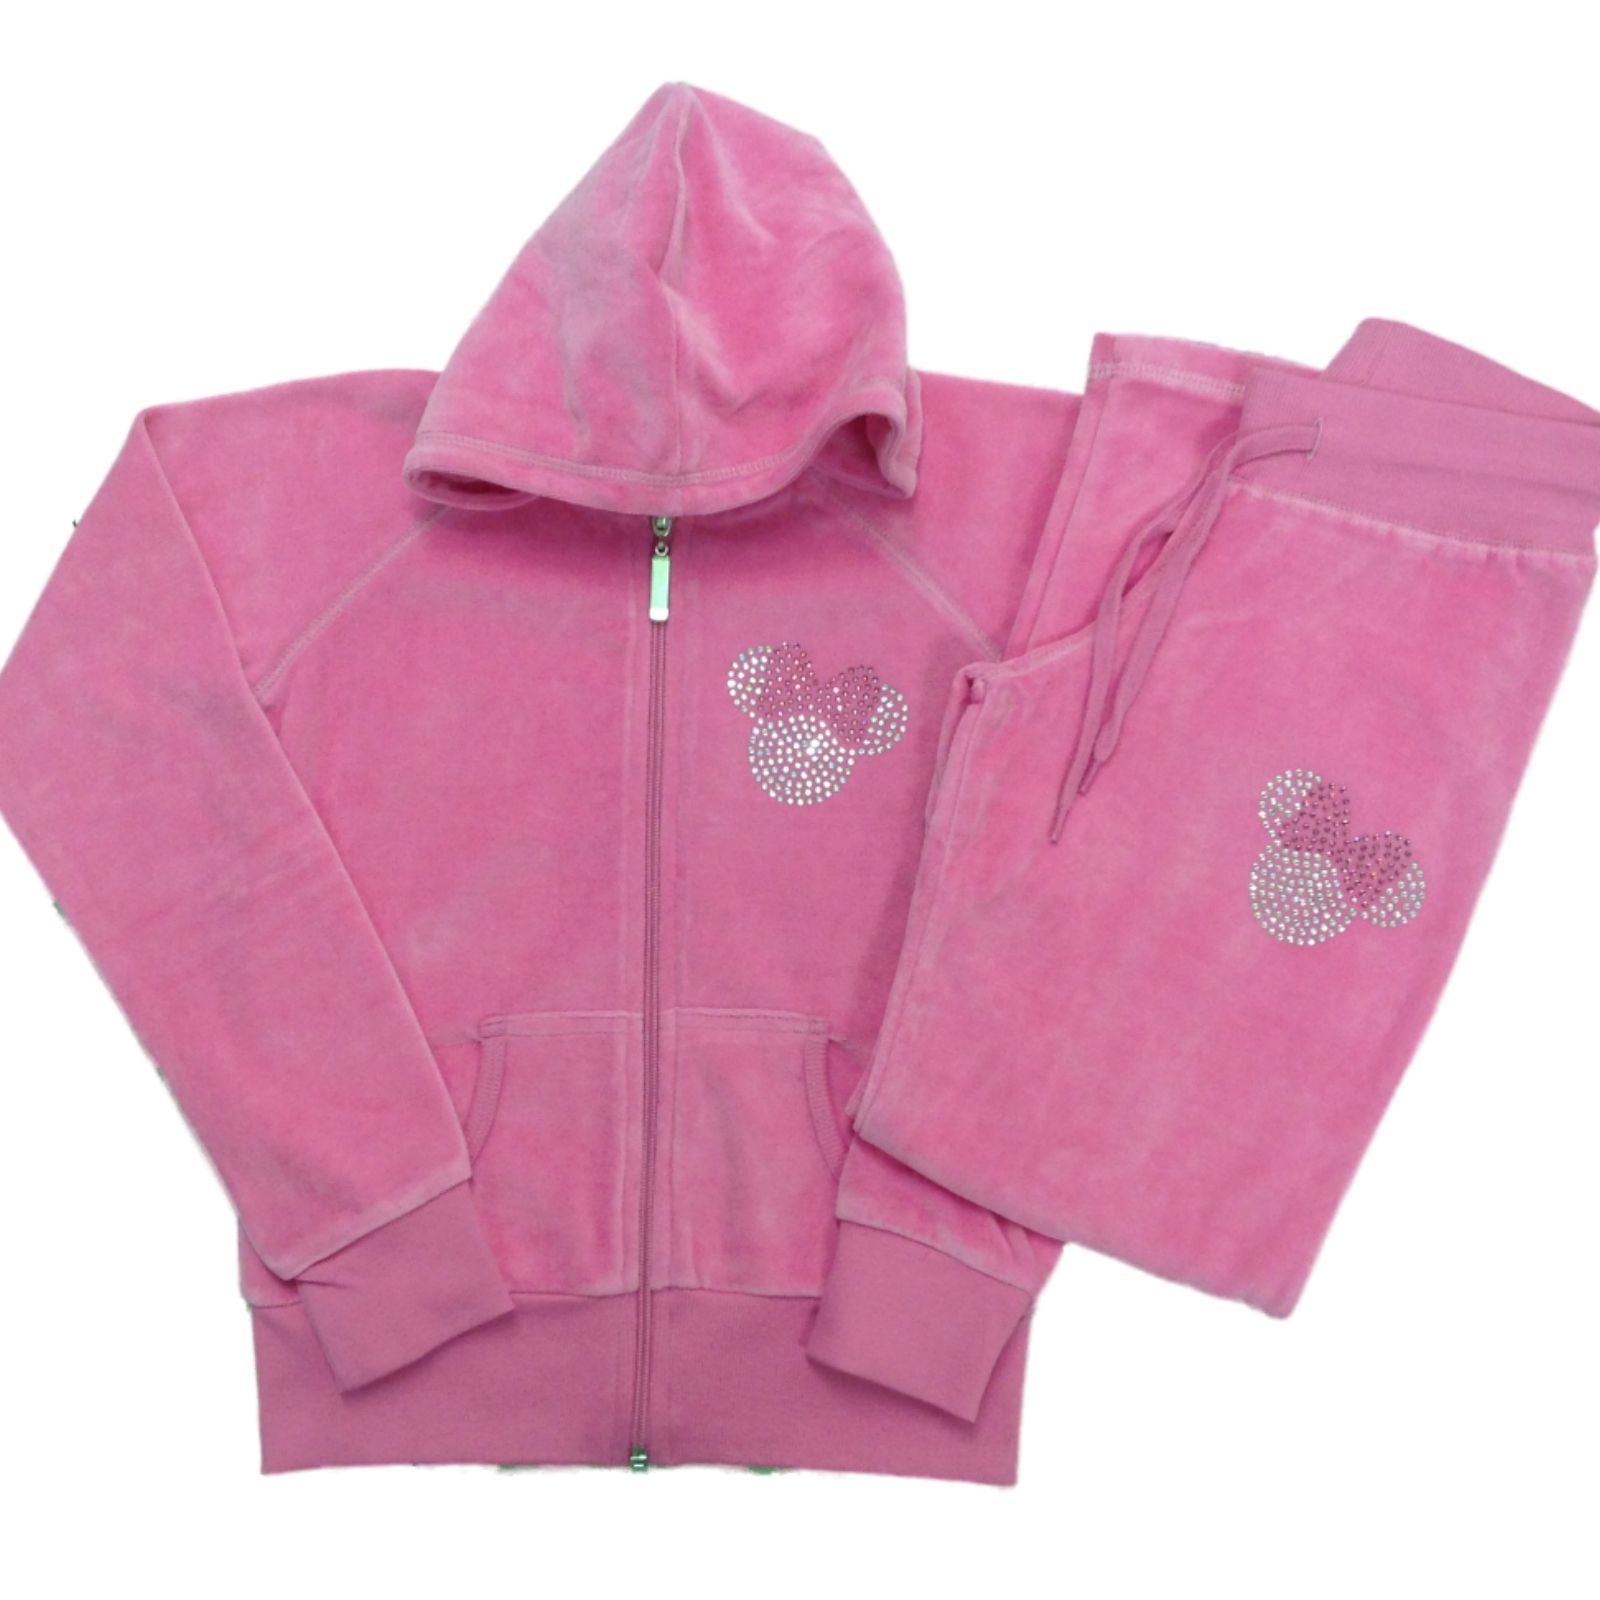 Custom Name Rhinestone Embellished Hoodie Sweat Shirt for Girls Pls message